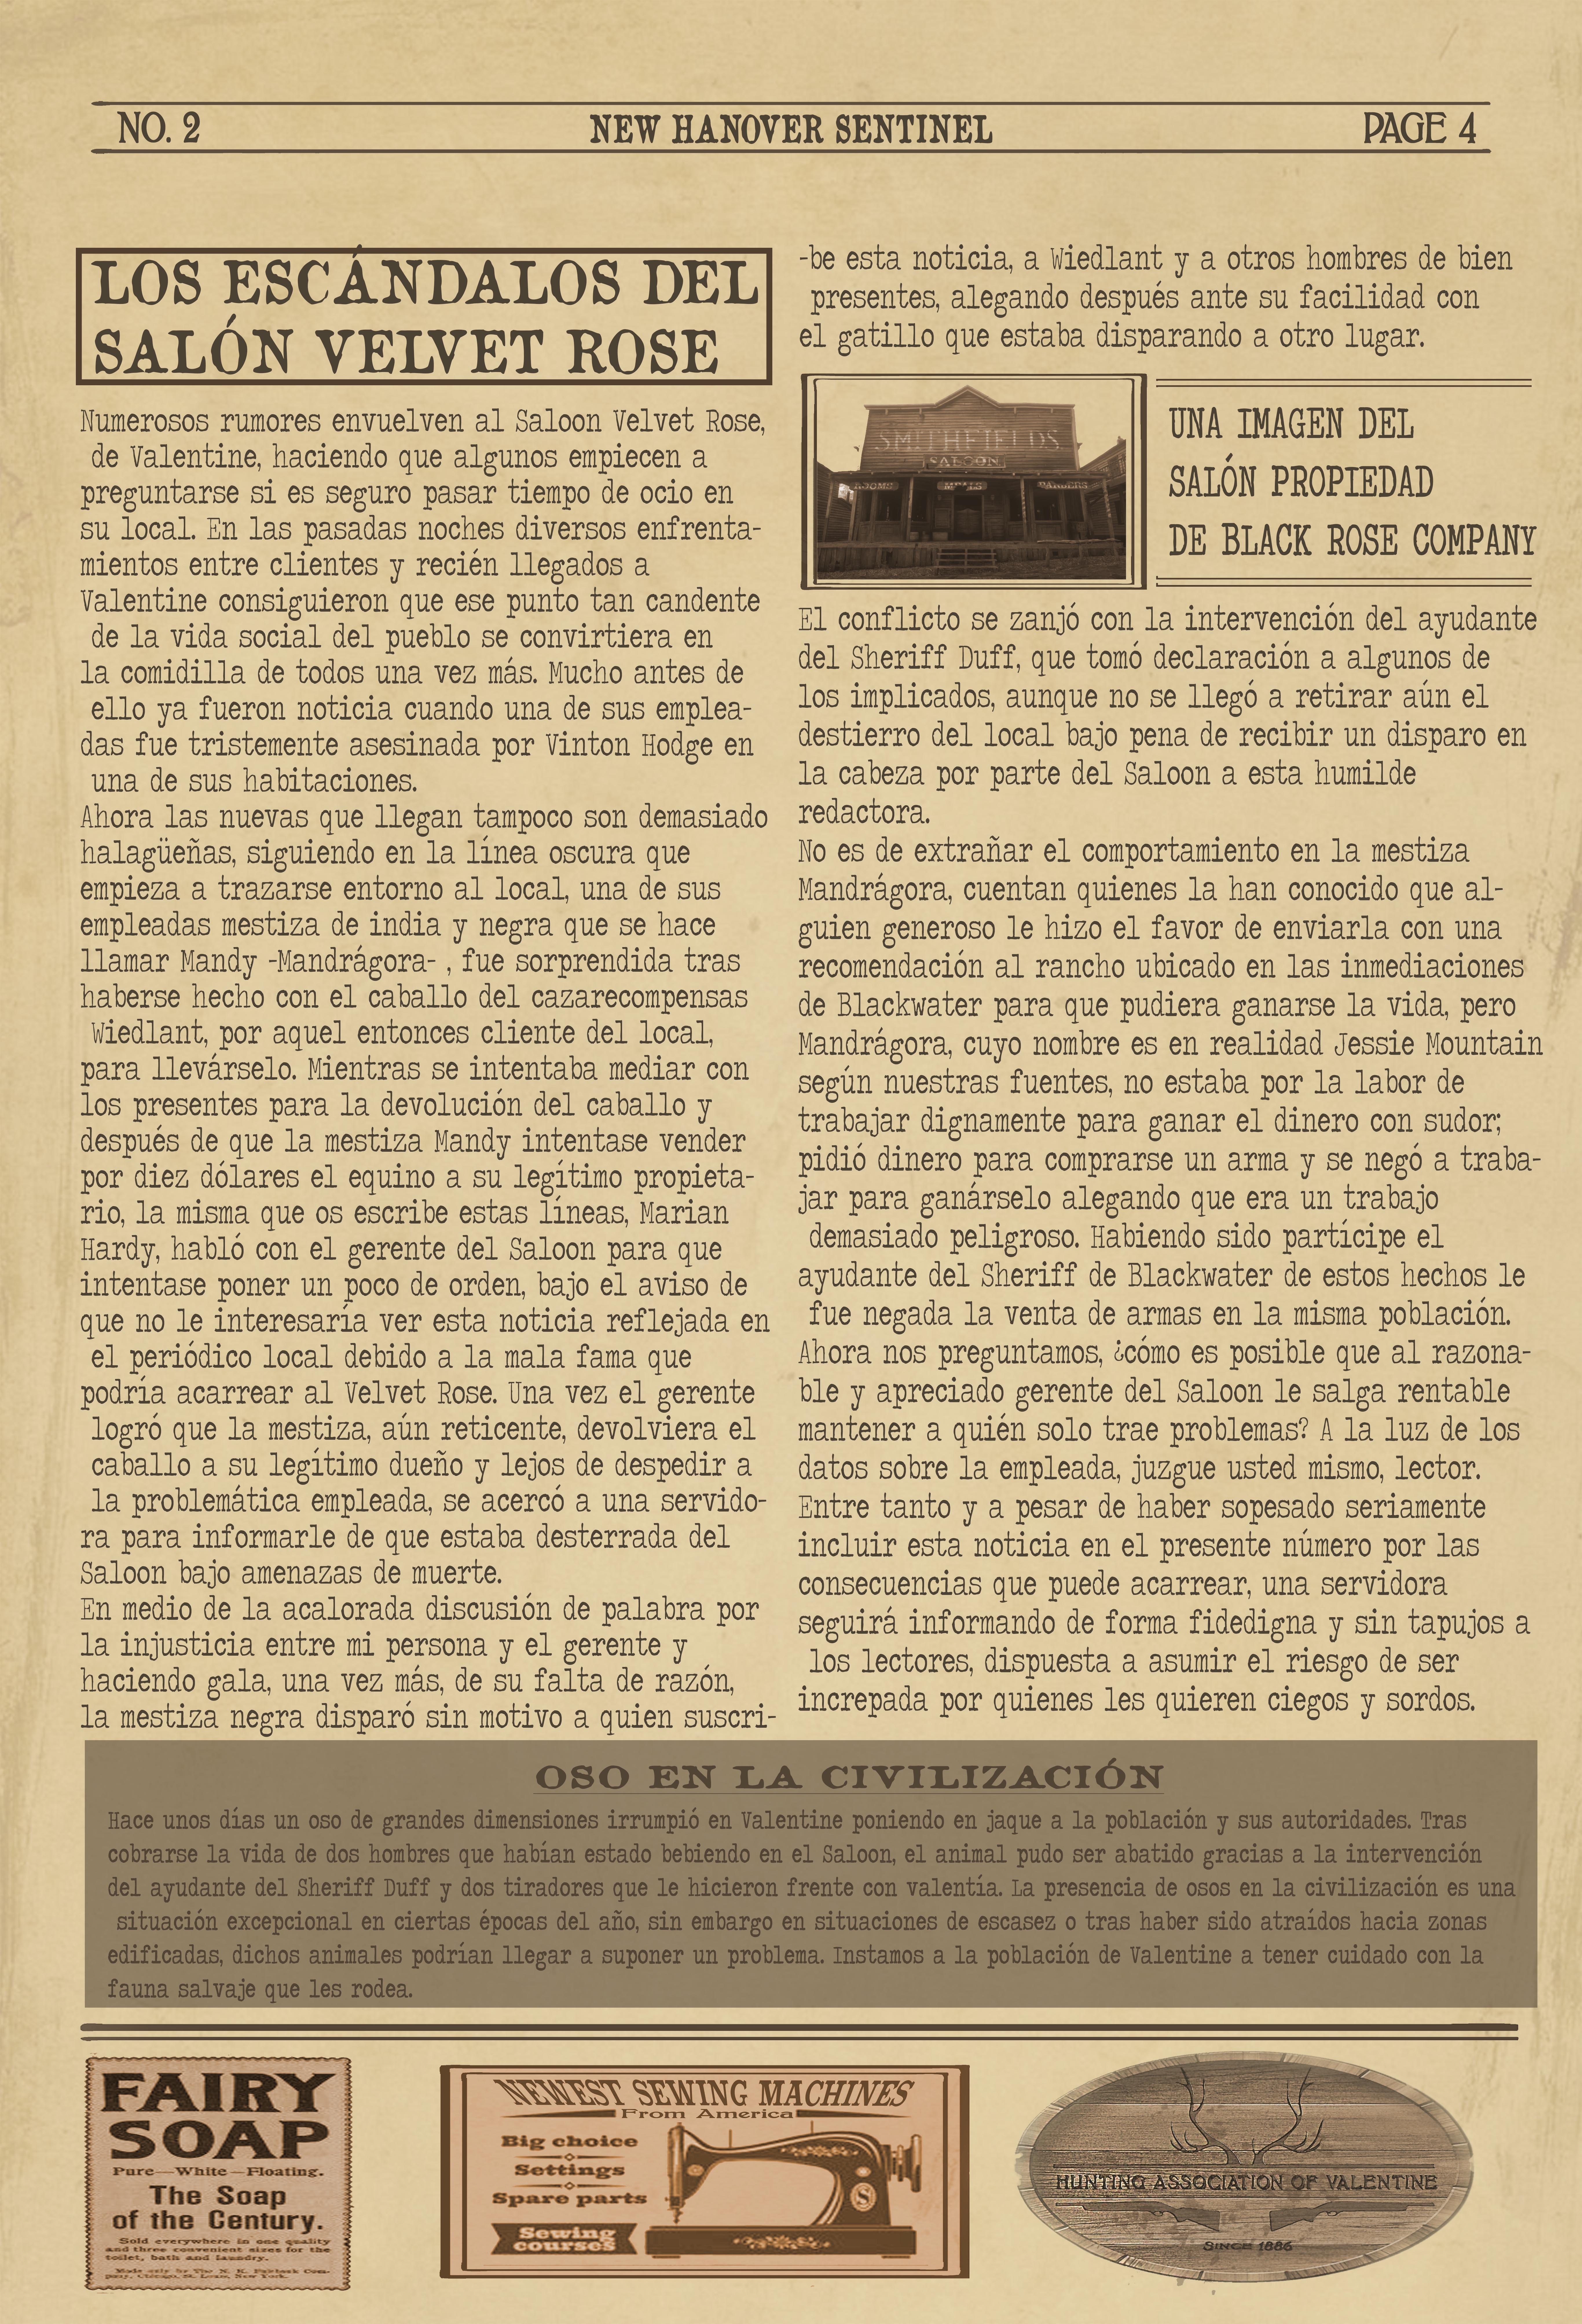 [Imagen: LOW_Periodico_New_Hanover_Sentinel_-_Num...gina_4.jpg]